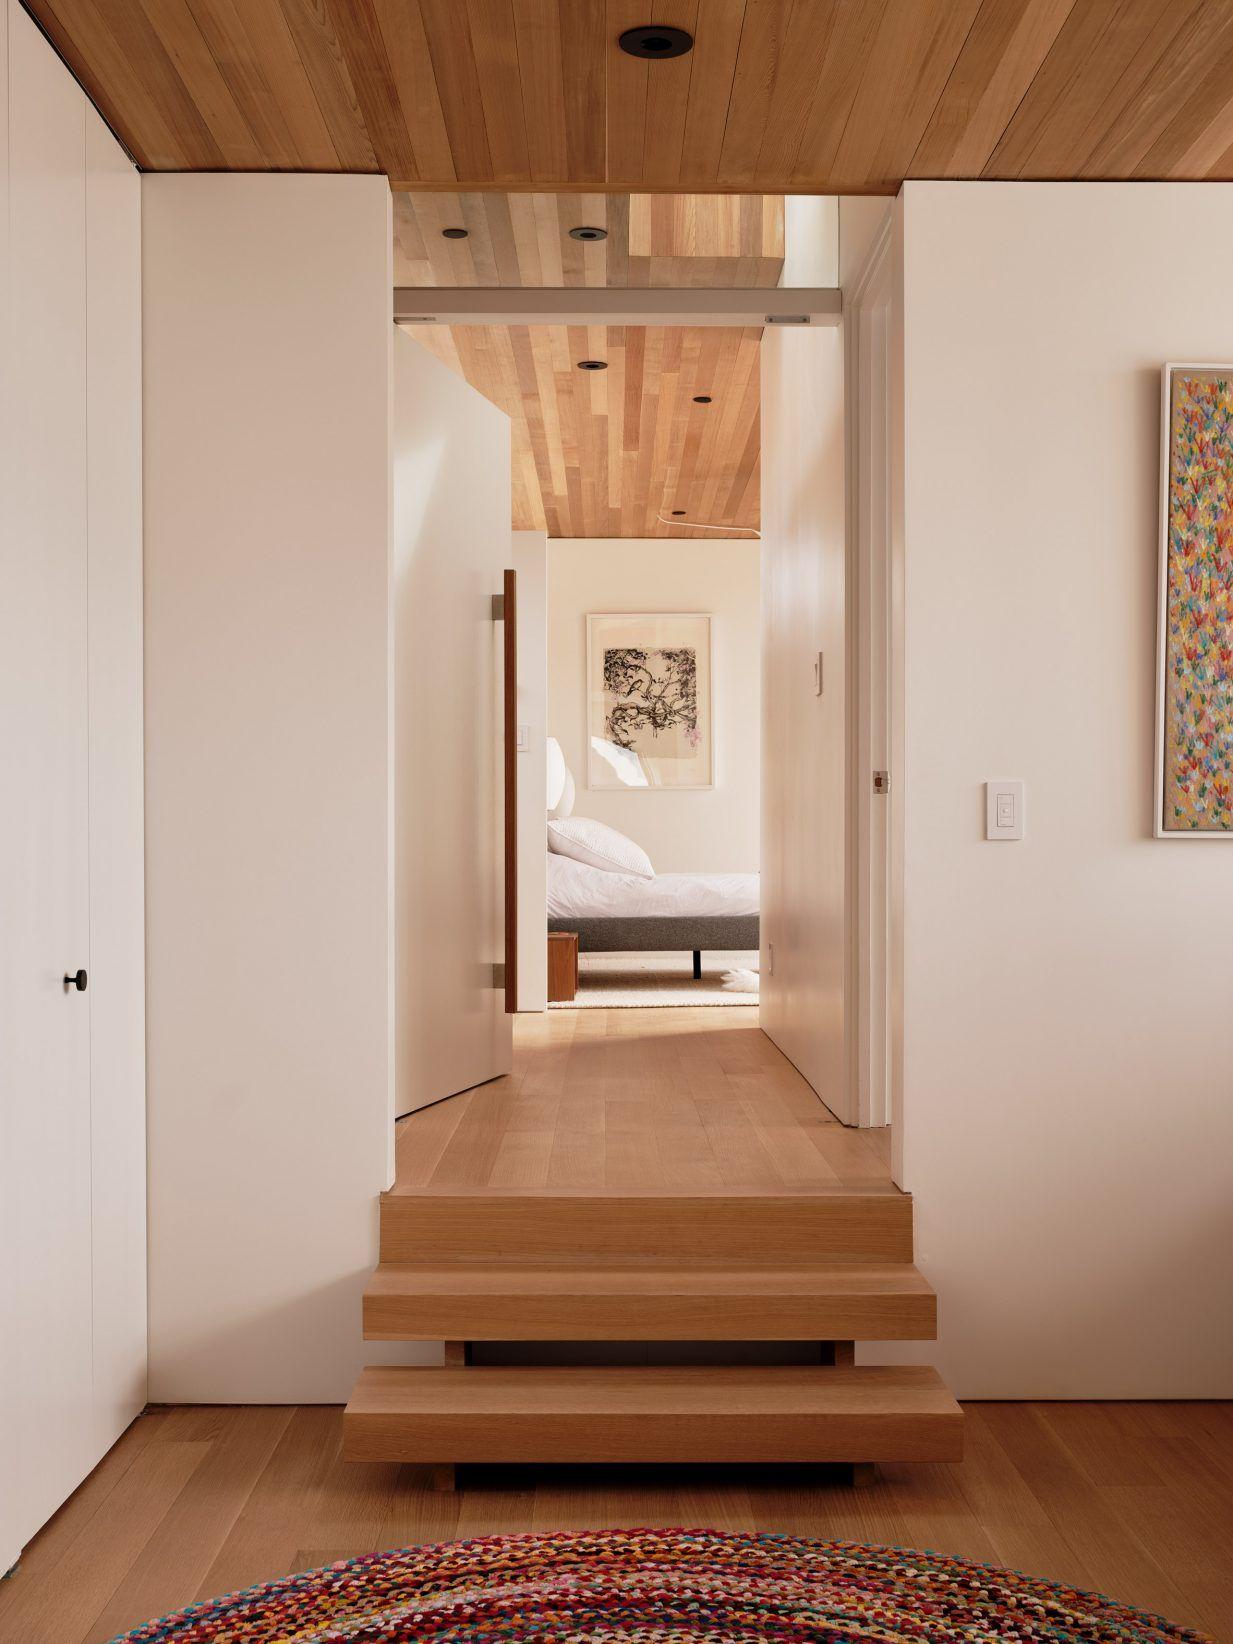 RasA Studio builds WalkStreet House near the beach in